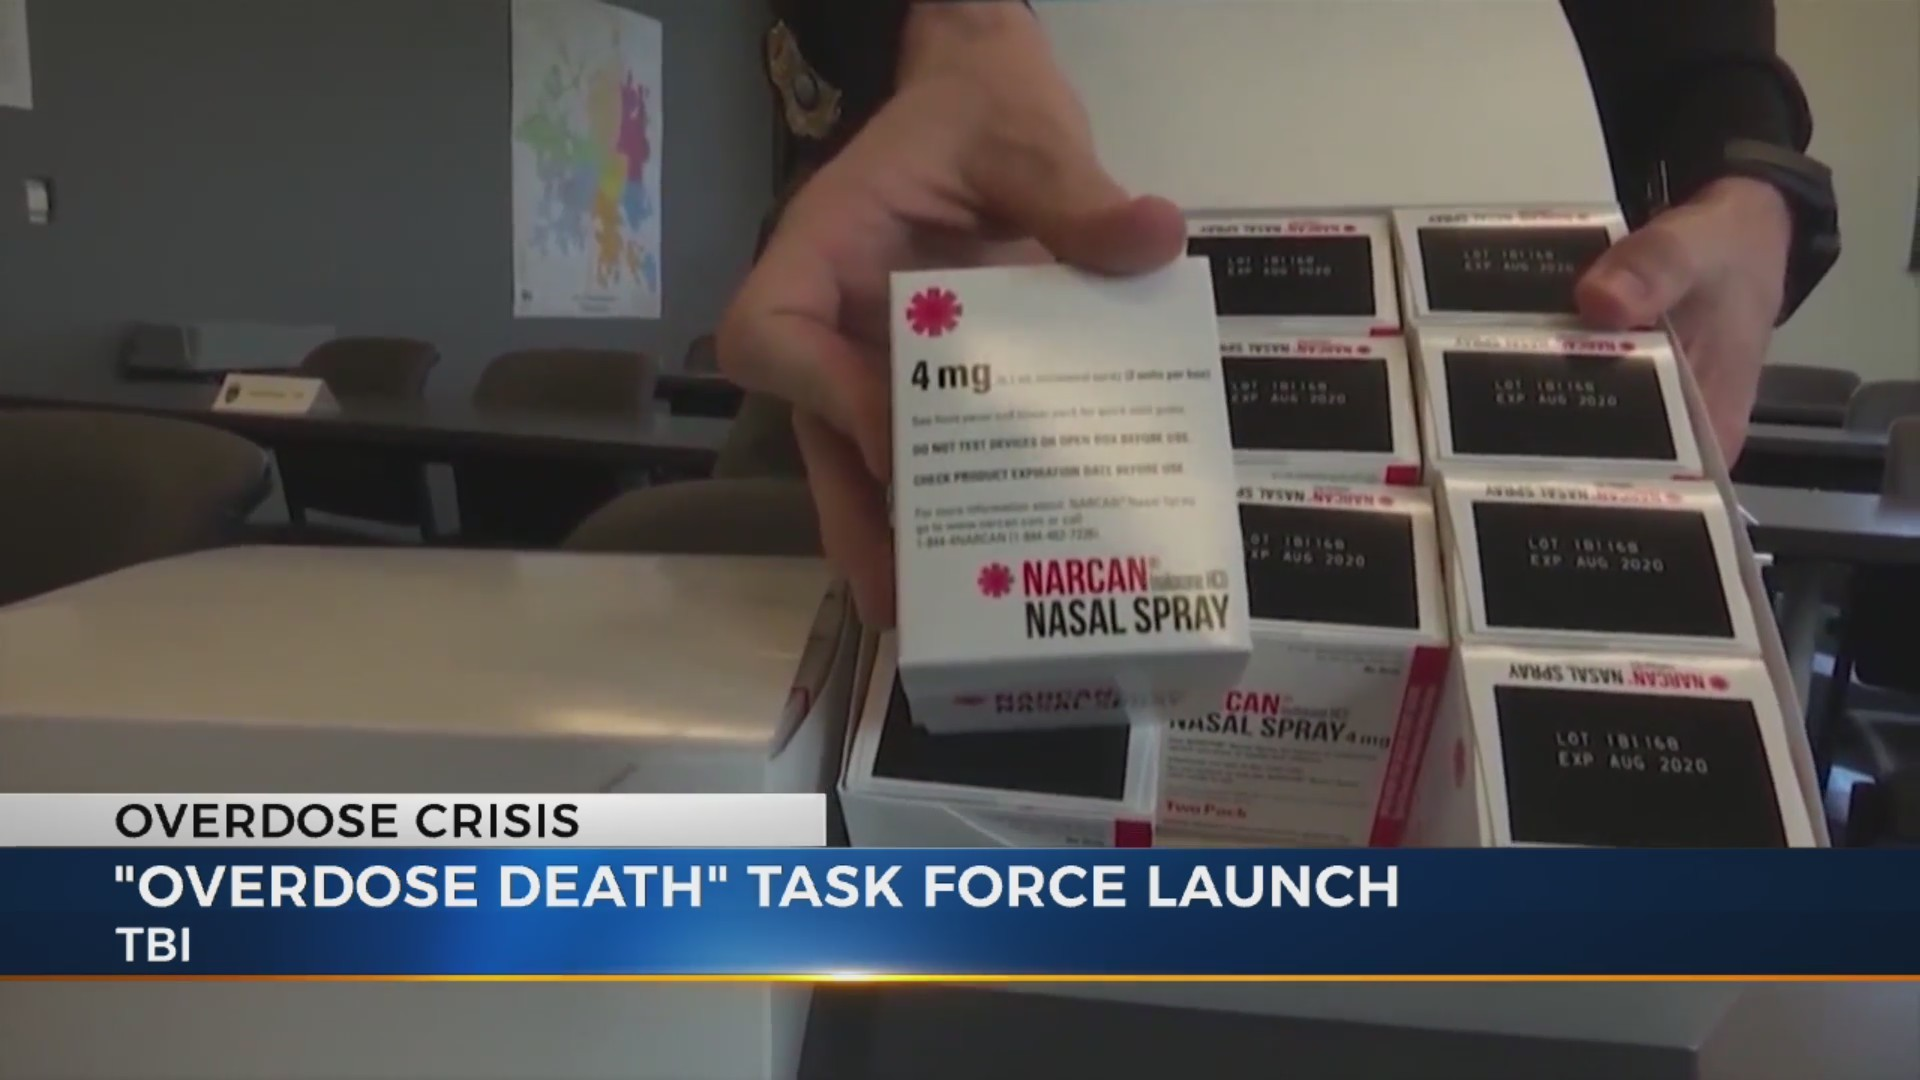 TBI task force overdoses